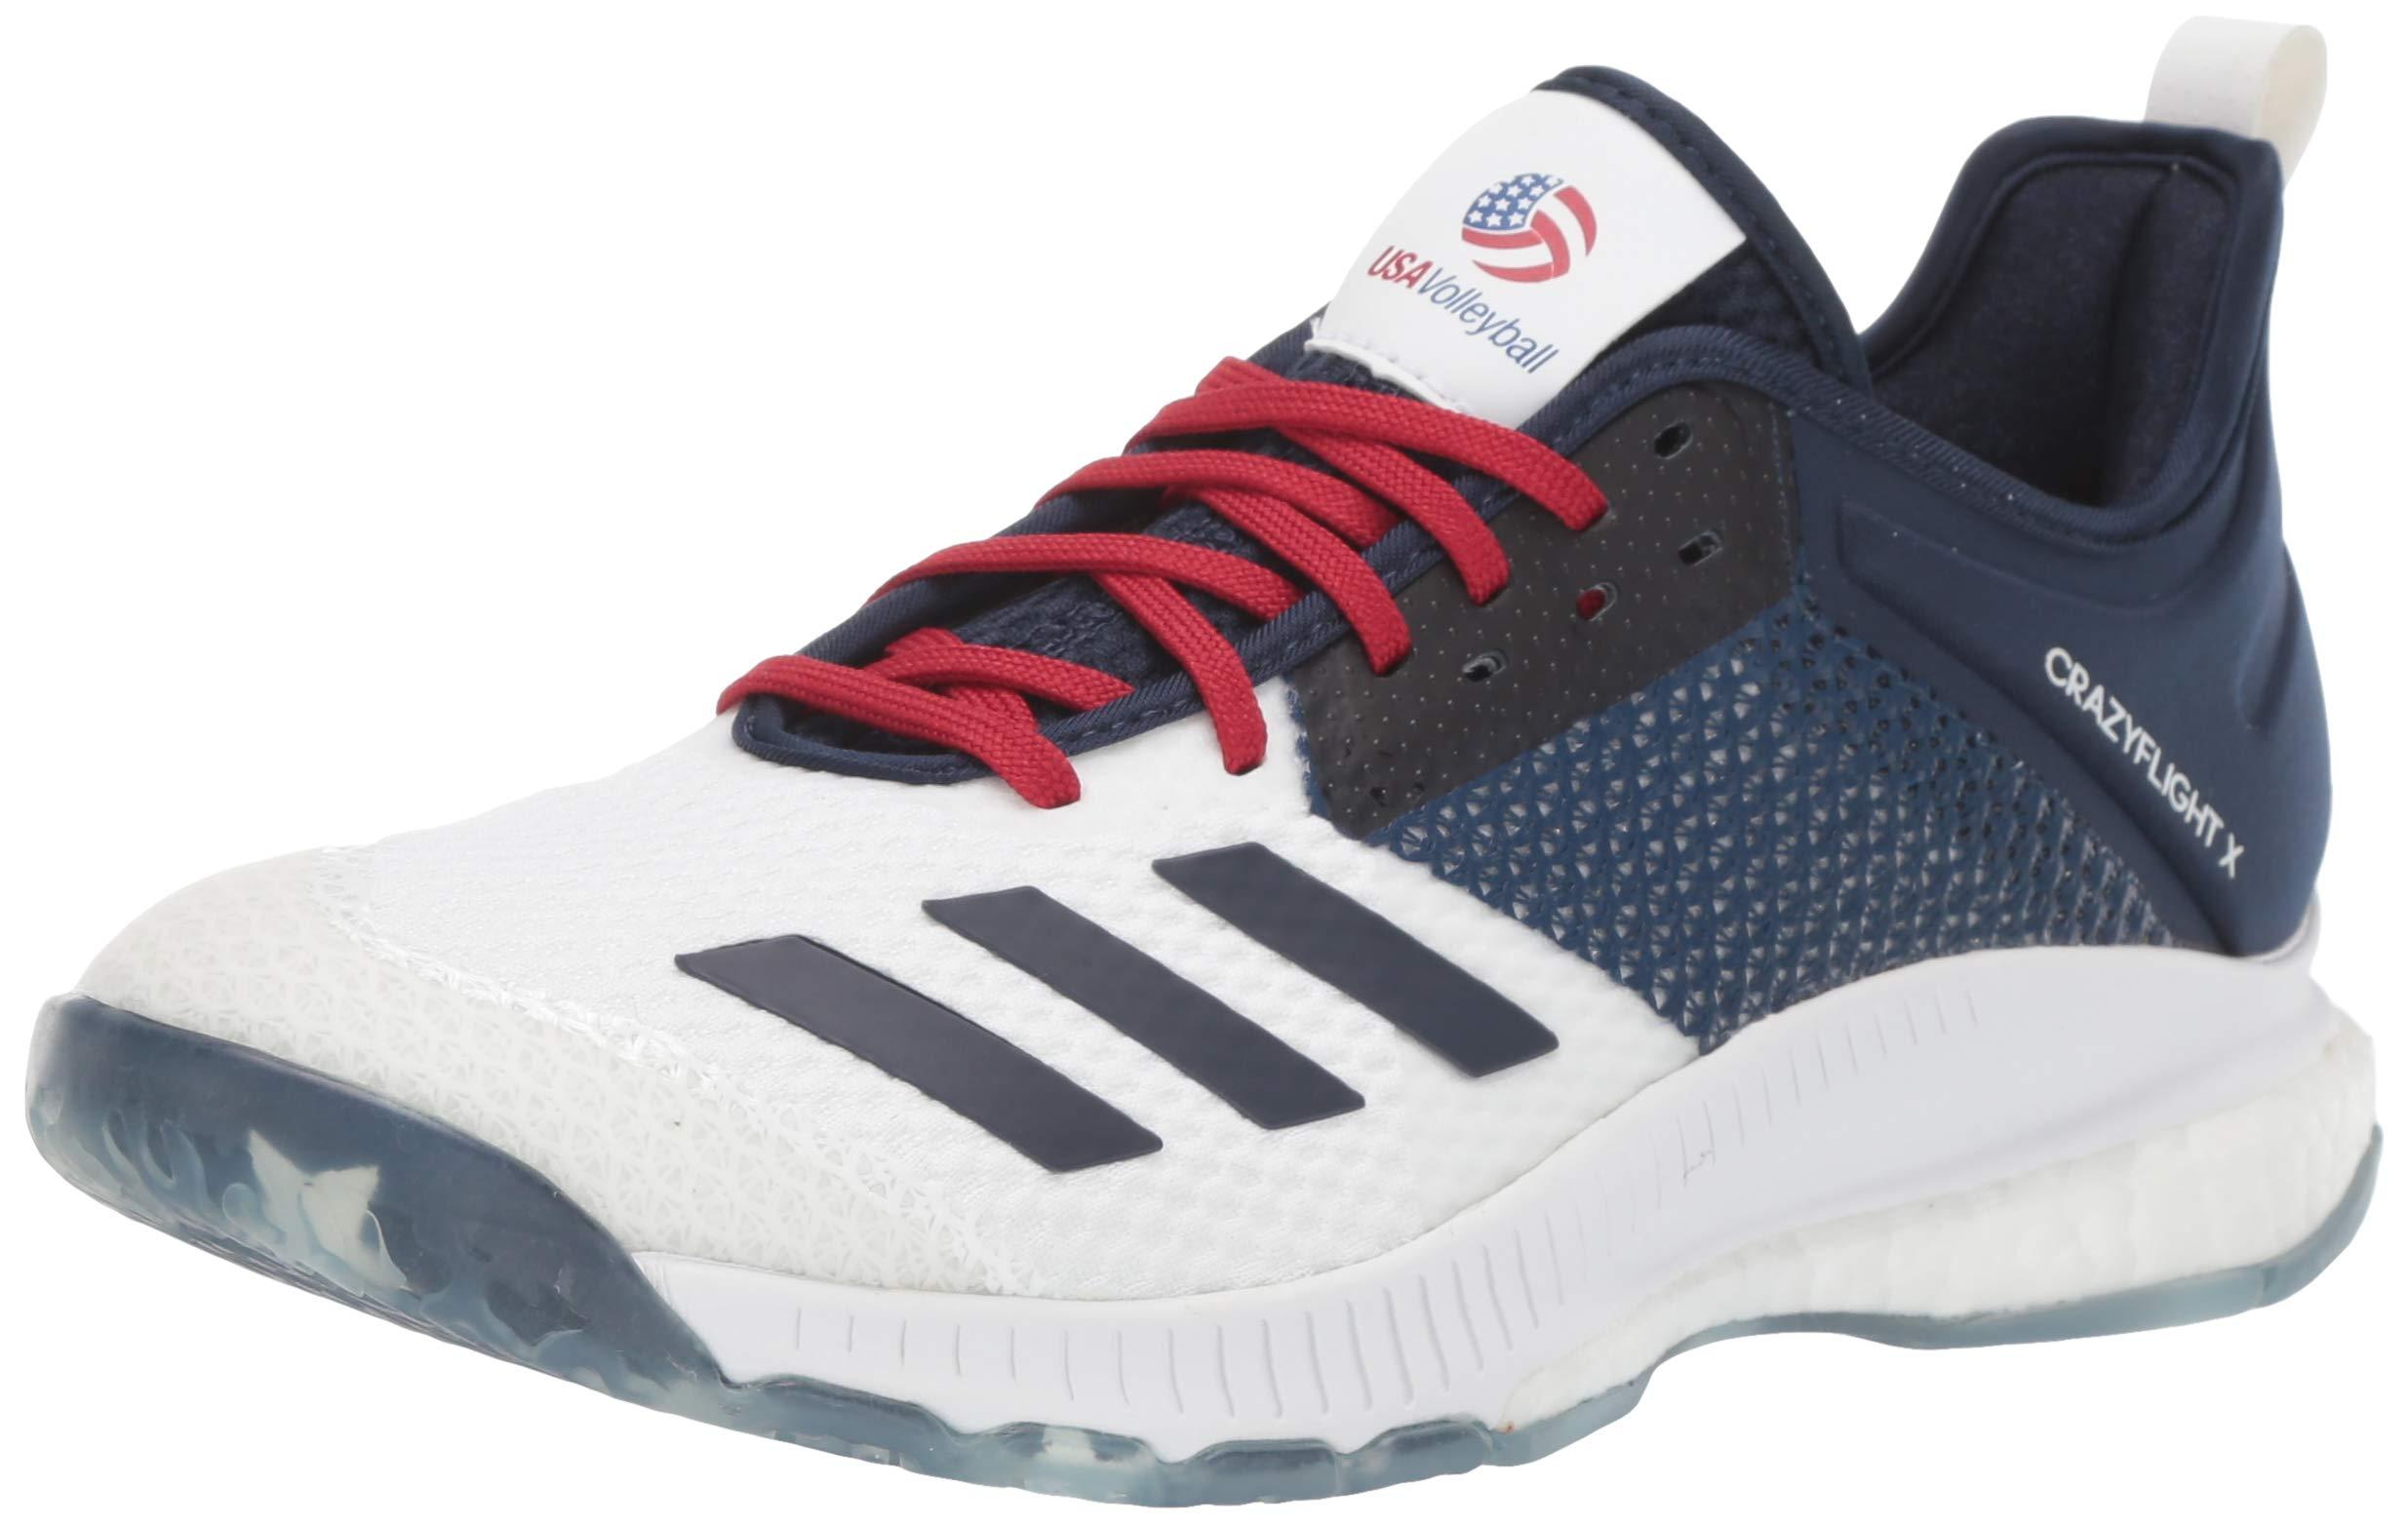 adidas Women's Crazyflight X3 Usav Volleyball Shoe